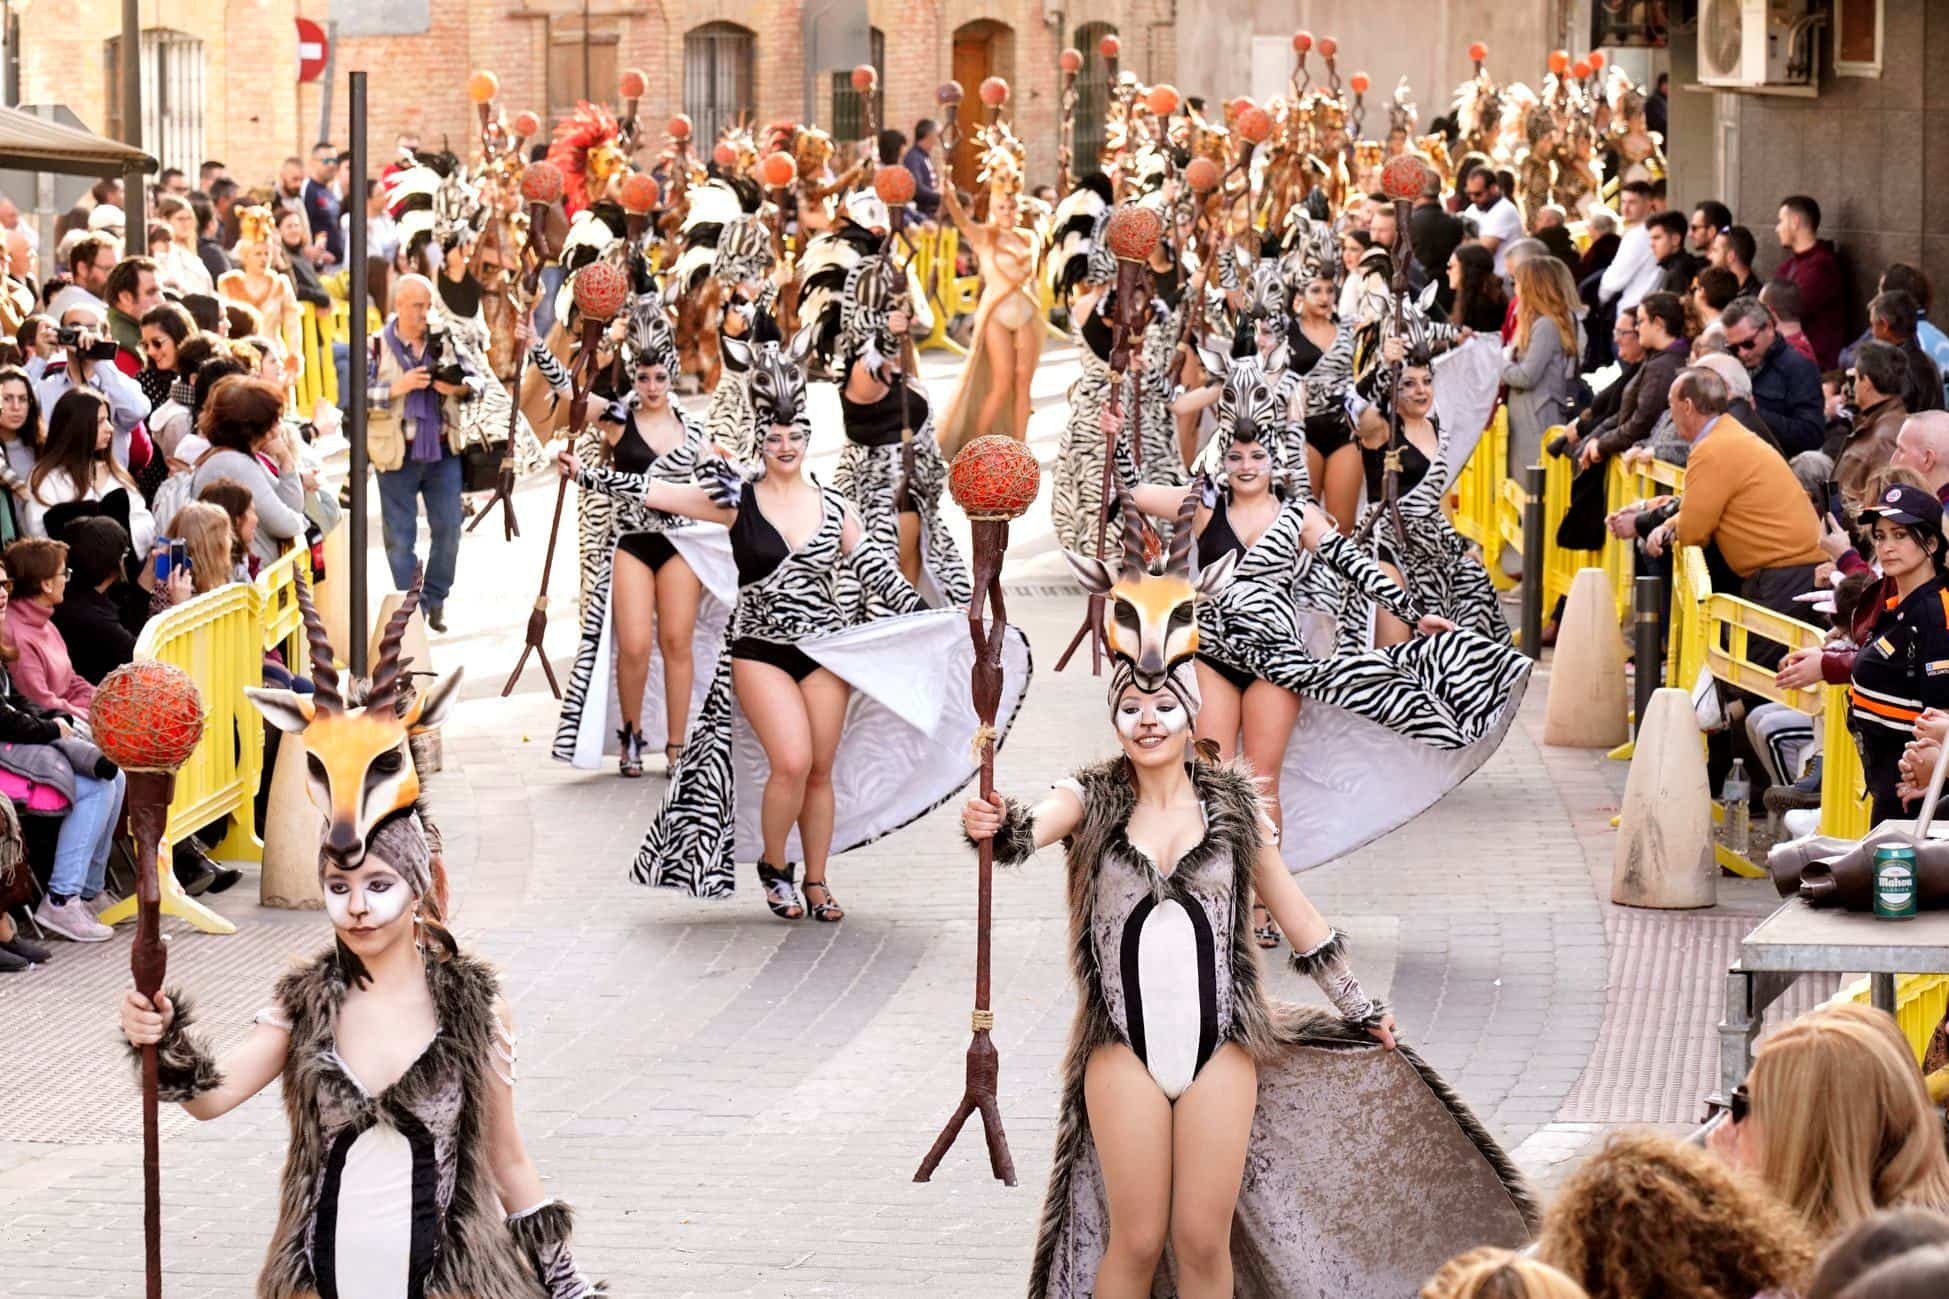 Carnaval de herencia 2020 ofertorio 102 - Selección de fotografías del Ofertorio del Carnaval de Herencia